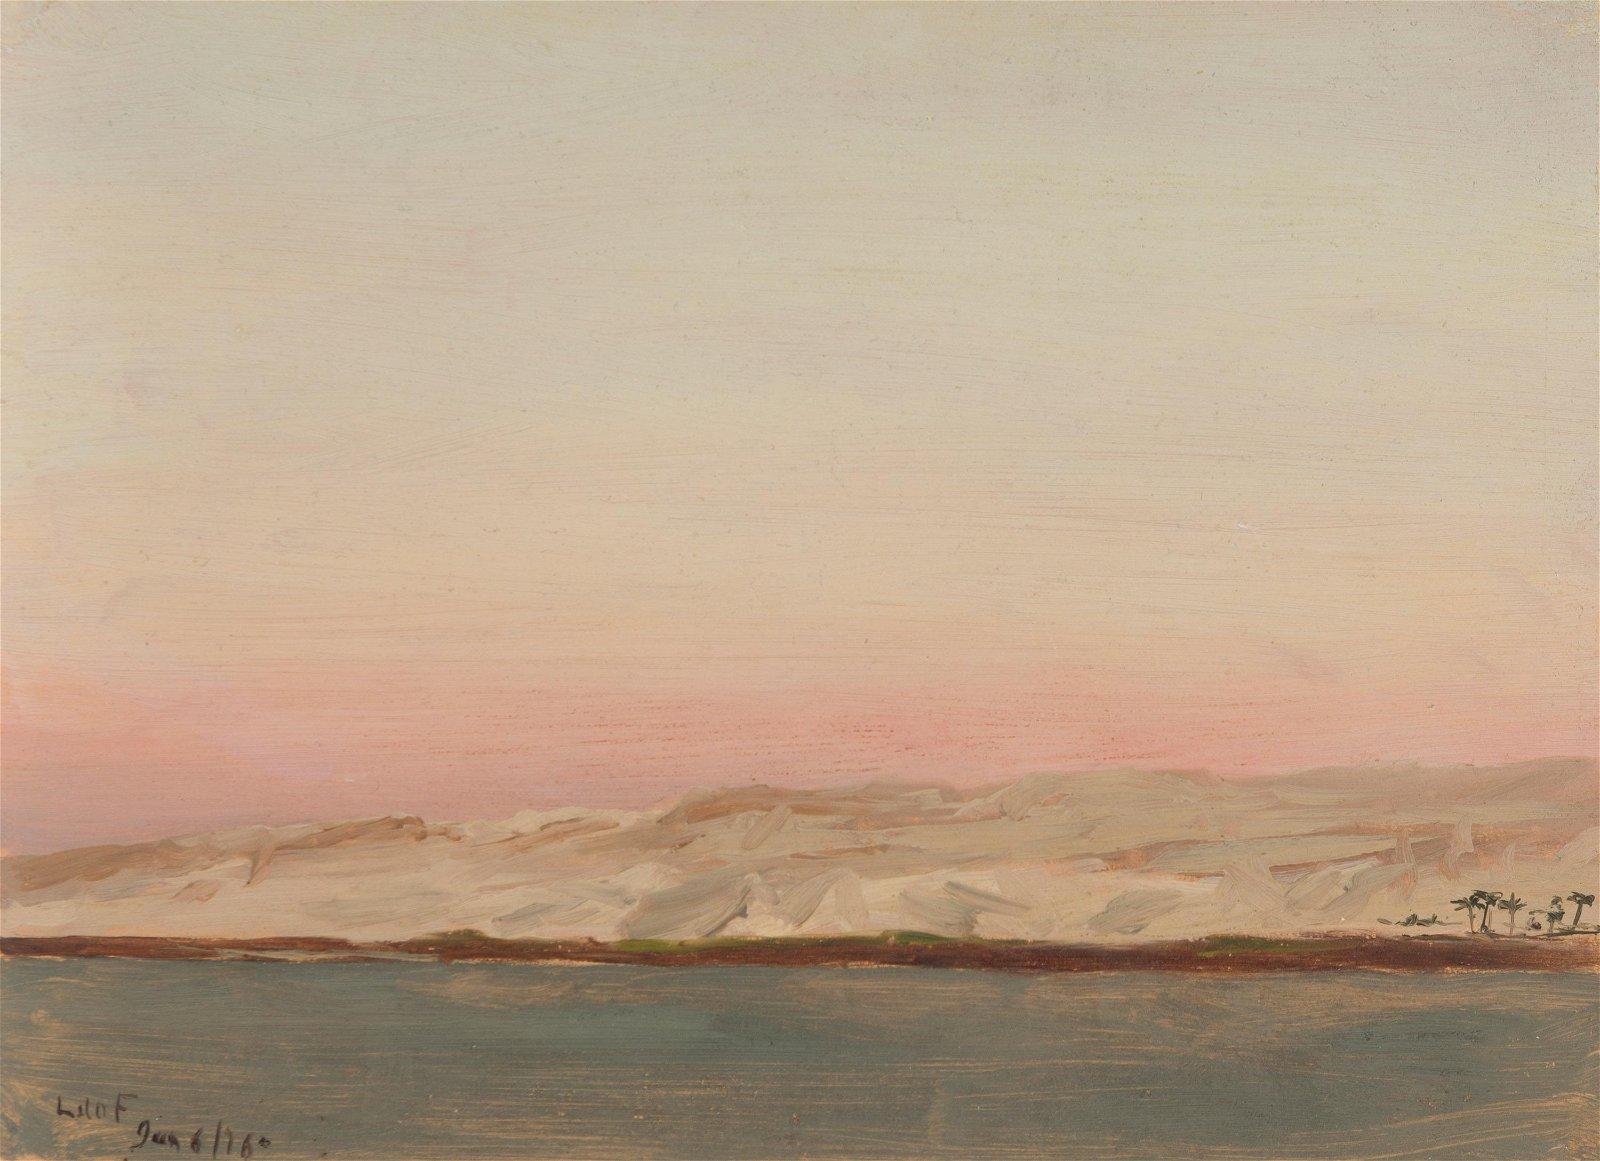 Lockwood de Forest (1850-1932 Santa Barbara, CA)